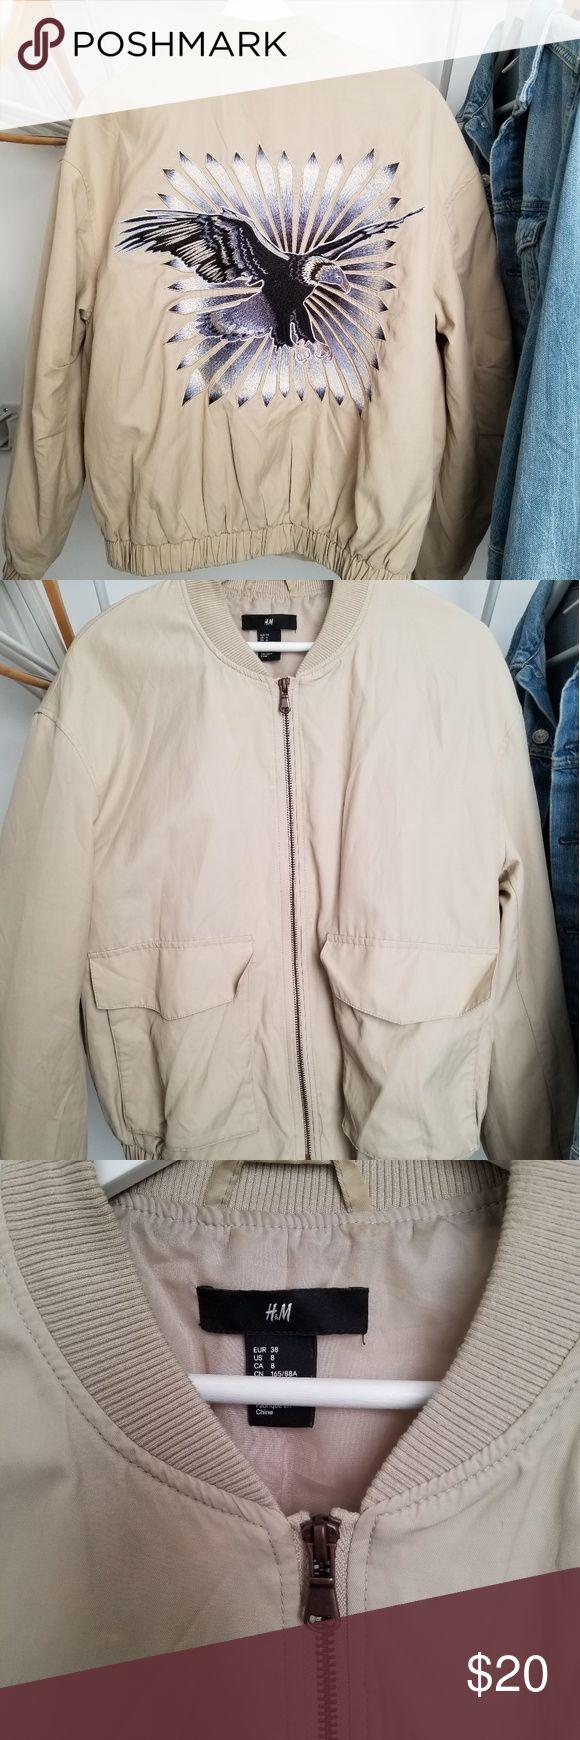 Bomber jacket Bomber jacket, Jackets, H&m jackets